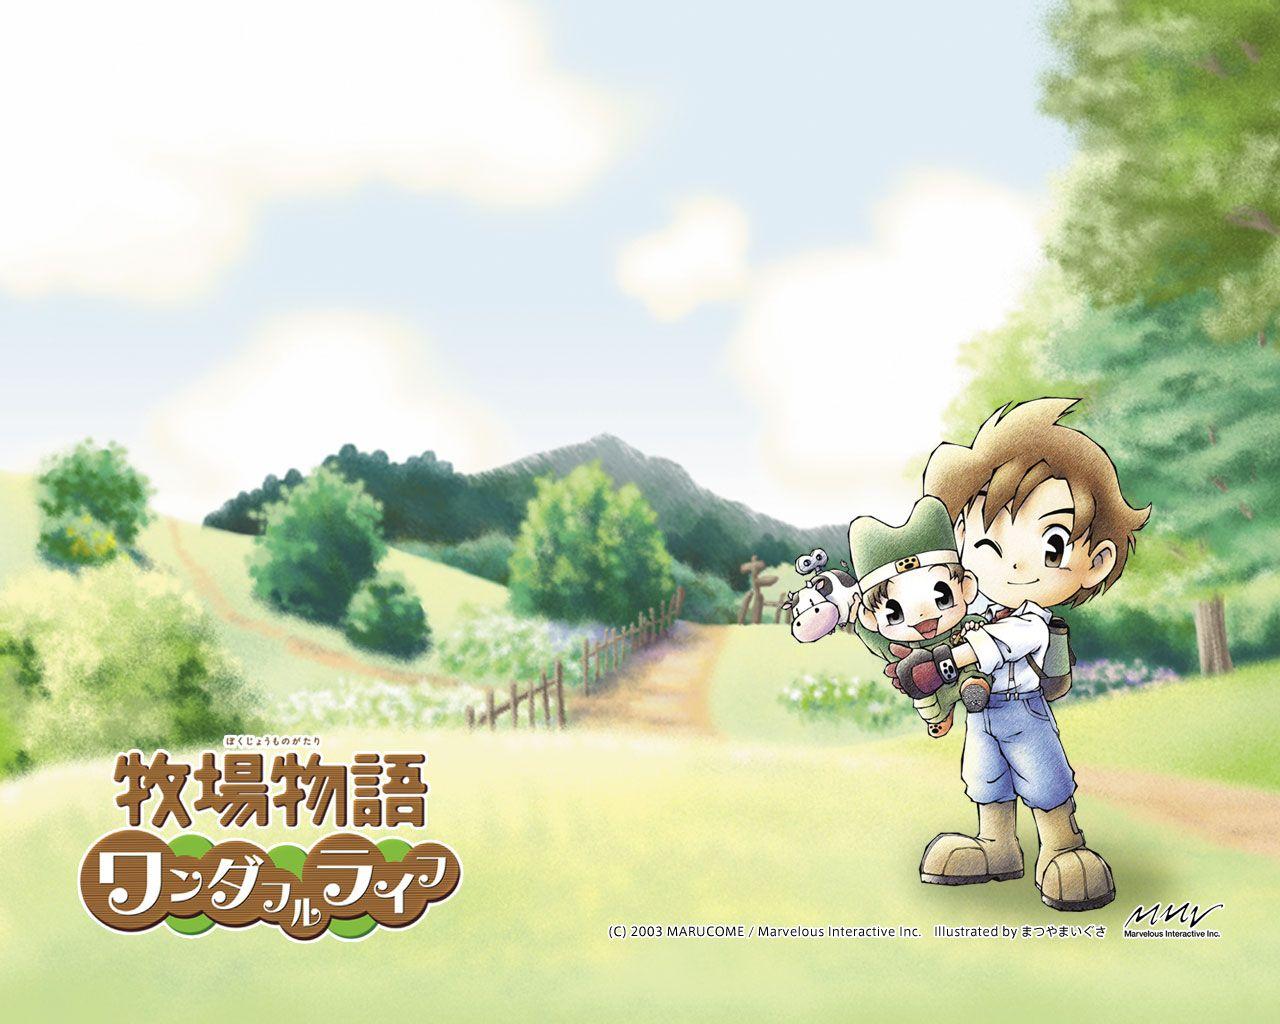 Latest 1 280 1 024 Pixels Harvest Moon Harvest Moon Game Harvest Moon Ds